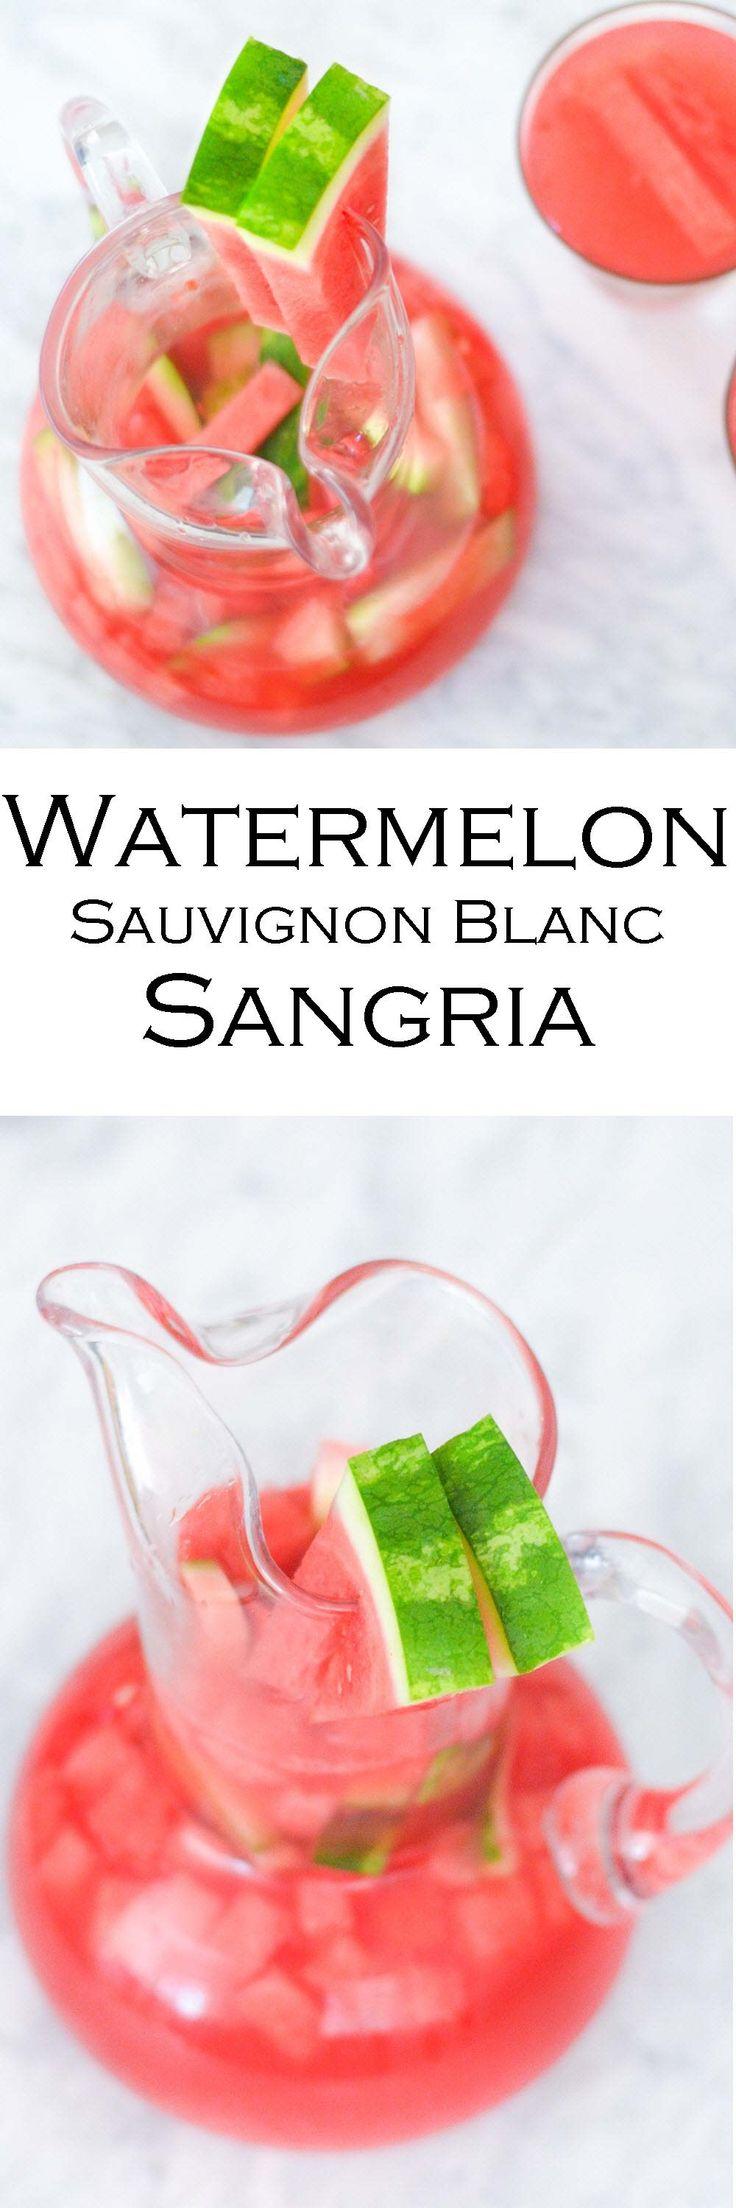 Watermelon Sangria - White Wine Summer Sangria #LMrecipes #sangria #whitewine #drinks #drinkrecipe #sauvignonblanc #whitewinesanria #drinkrecipes #summersangria #summerdrinks #watermelondrink #watermelon #foodblog #foodblogger